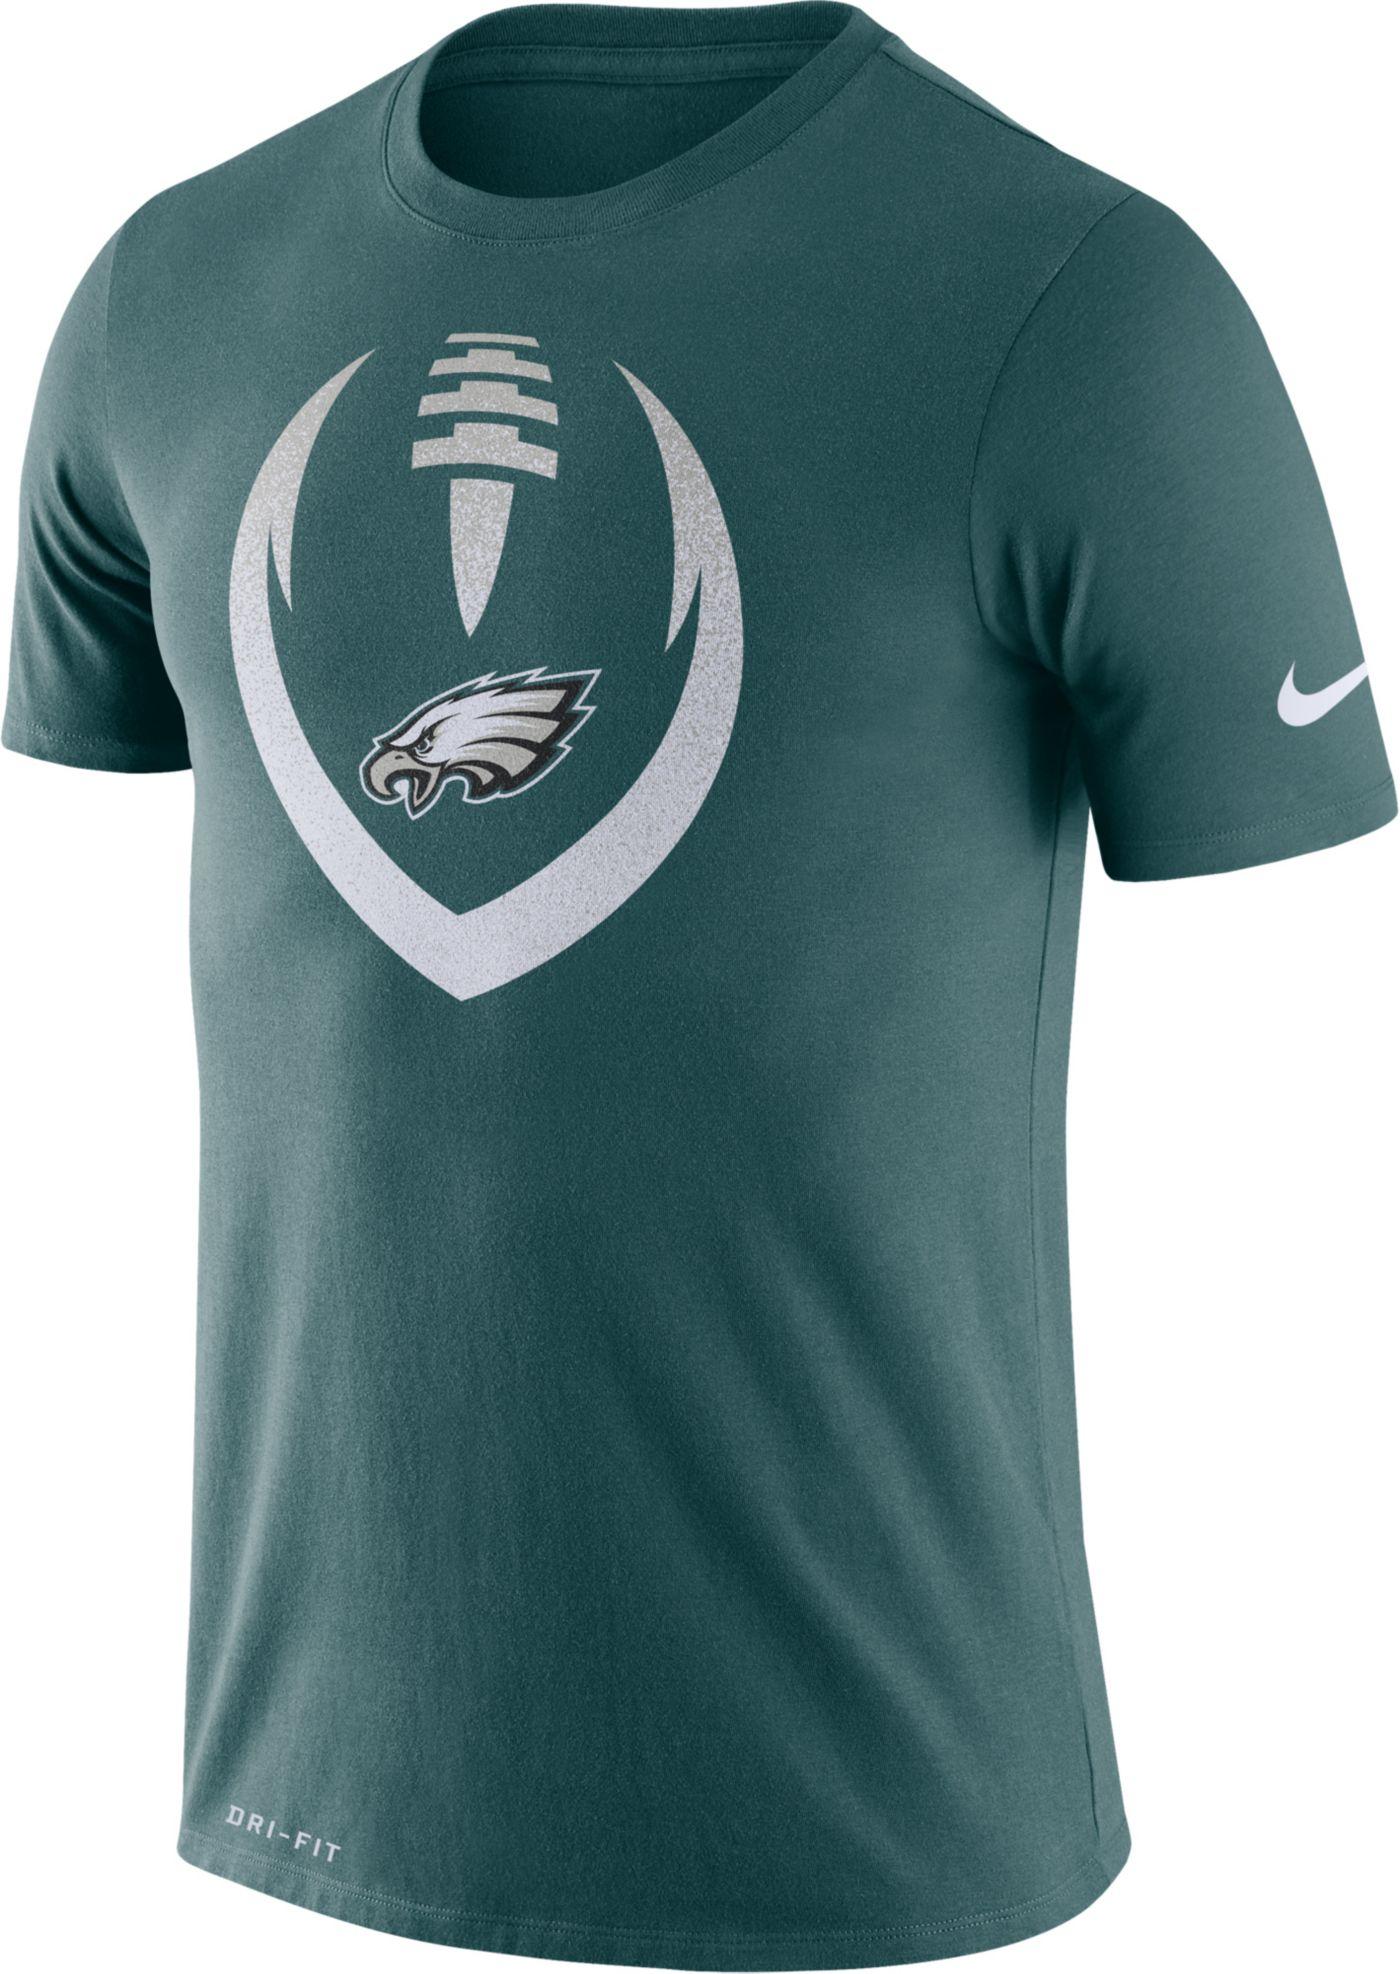 Nike Men's Philadelphia Eagles Icon Green Performance T-Shirt